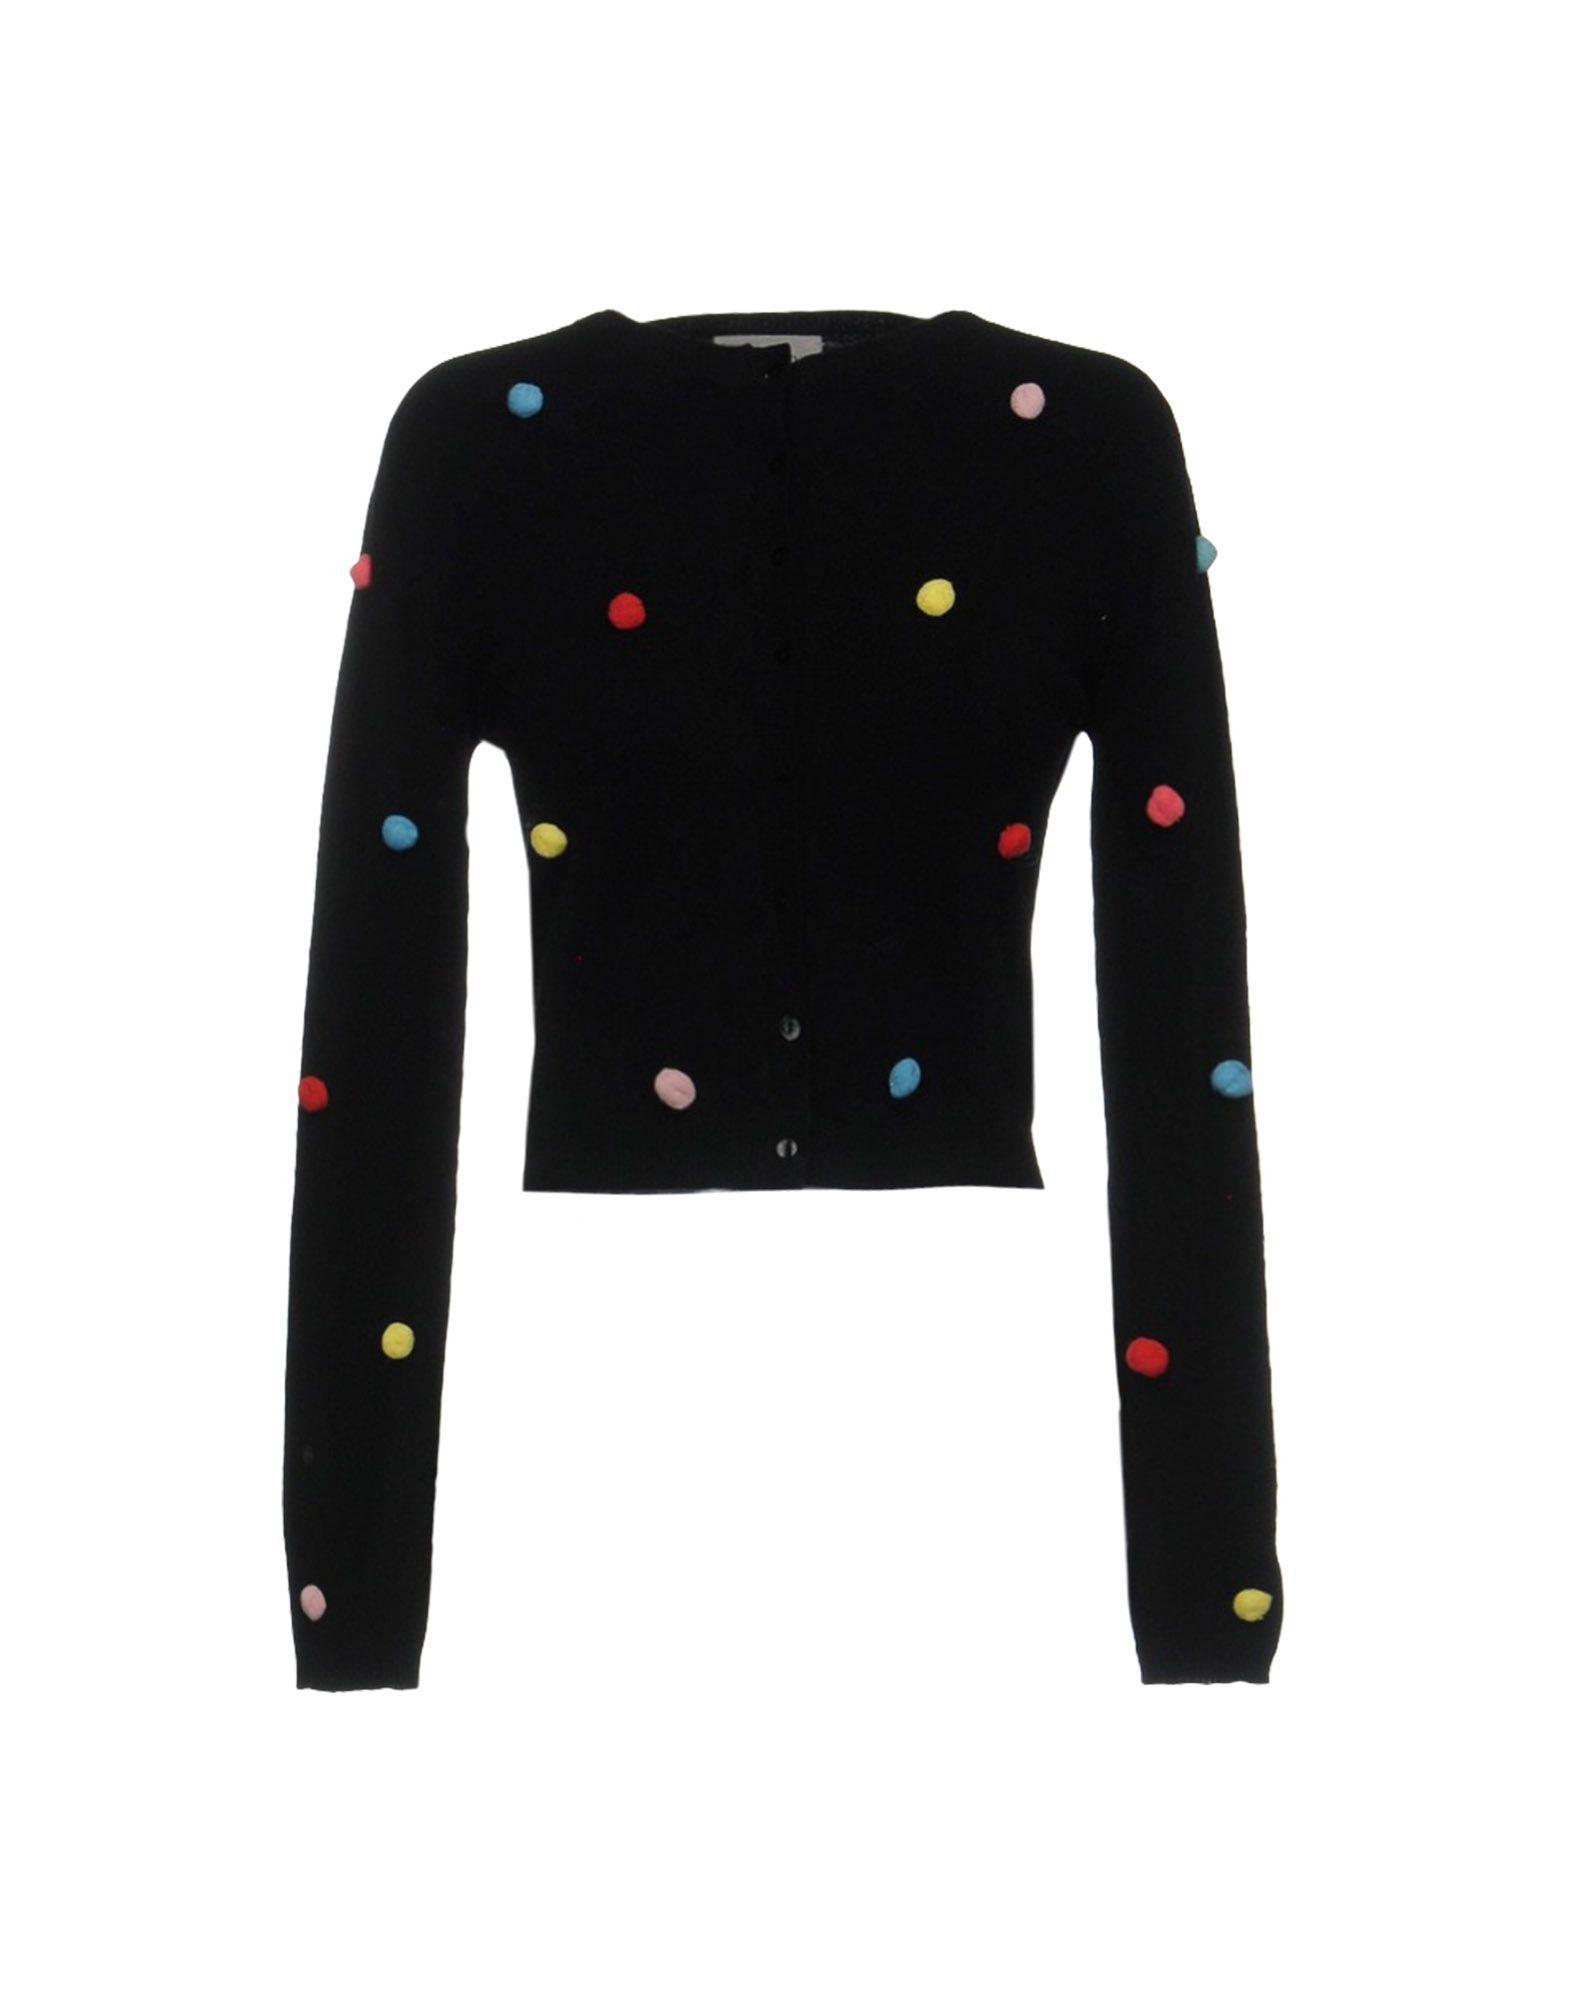 VICOLO Damen Strickjacke Farbe Schwarz Größe 1